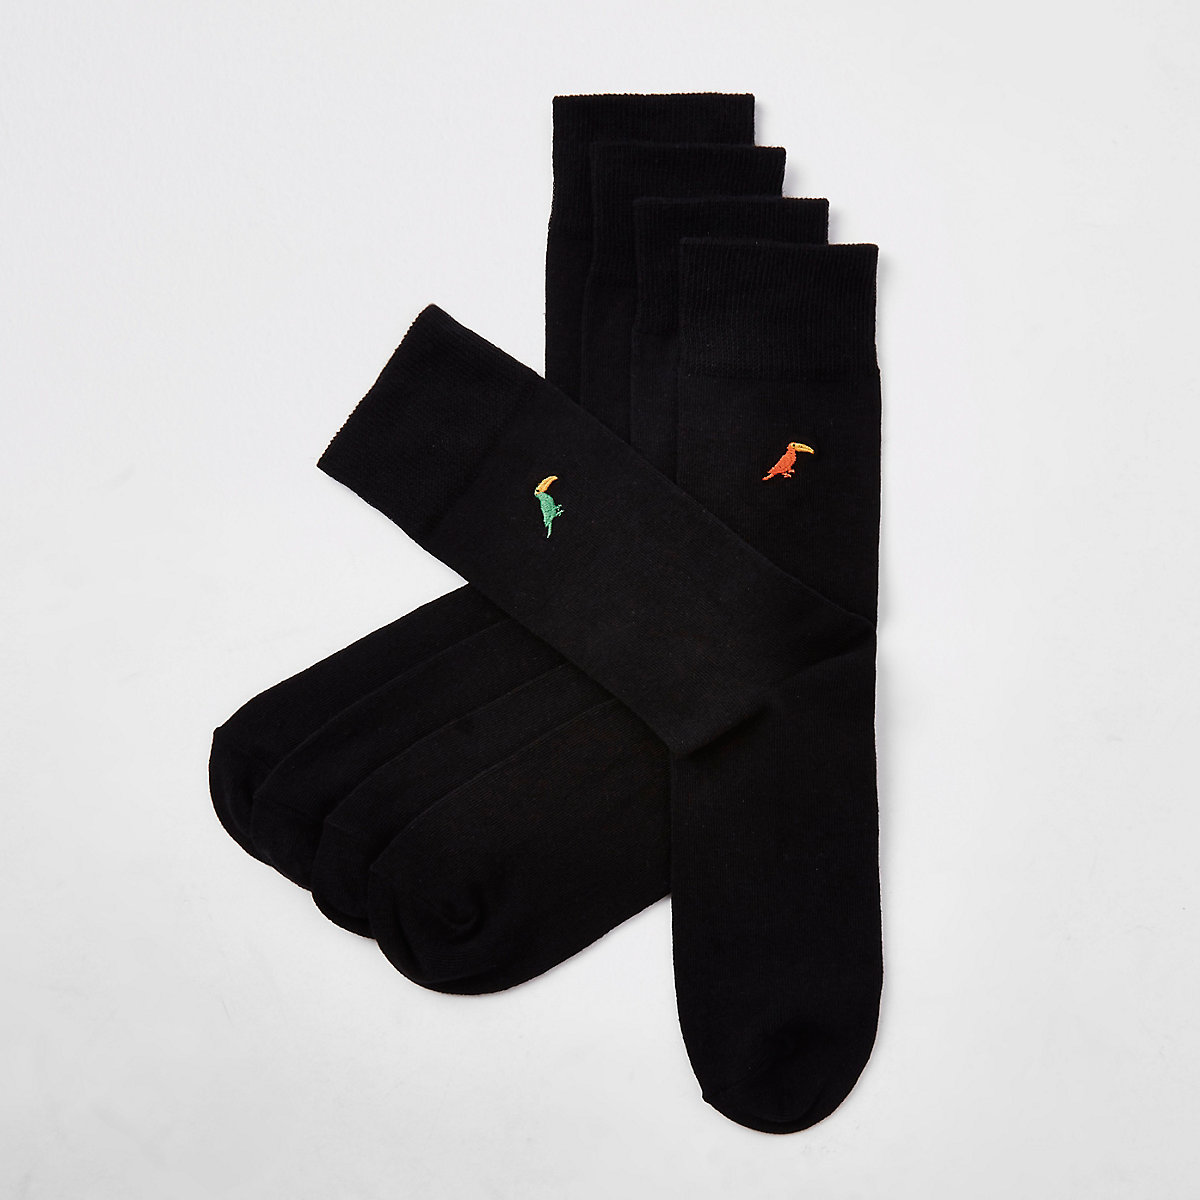 Black toucan embroidered socks 5 pack